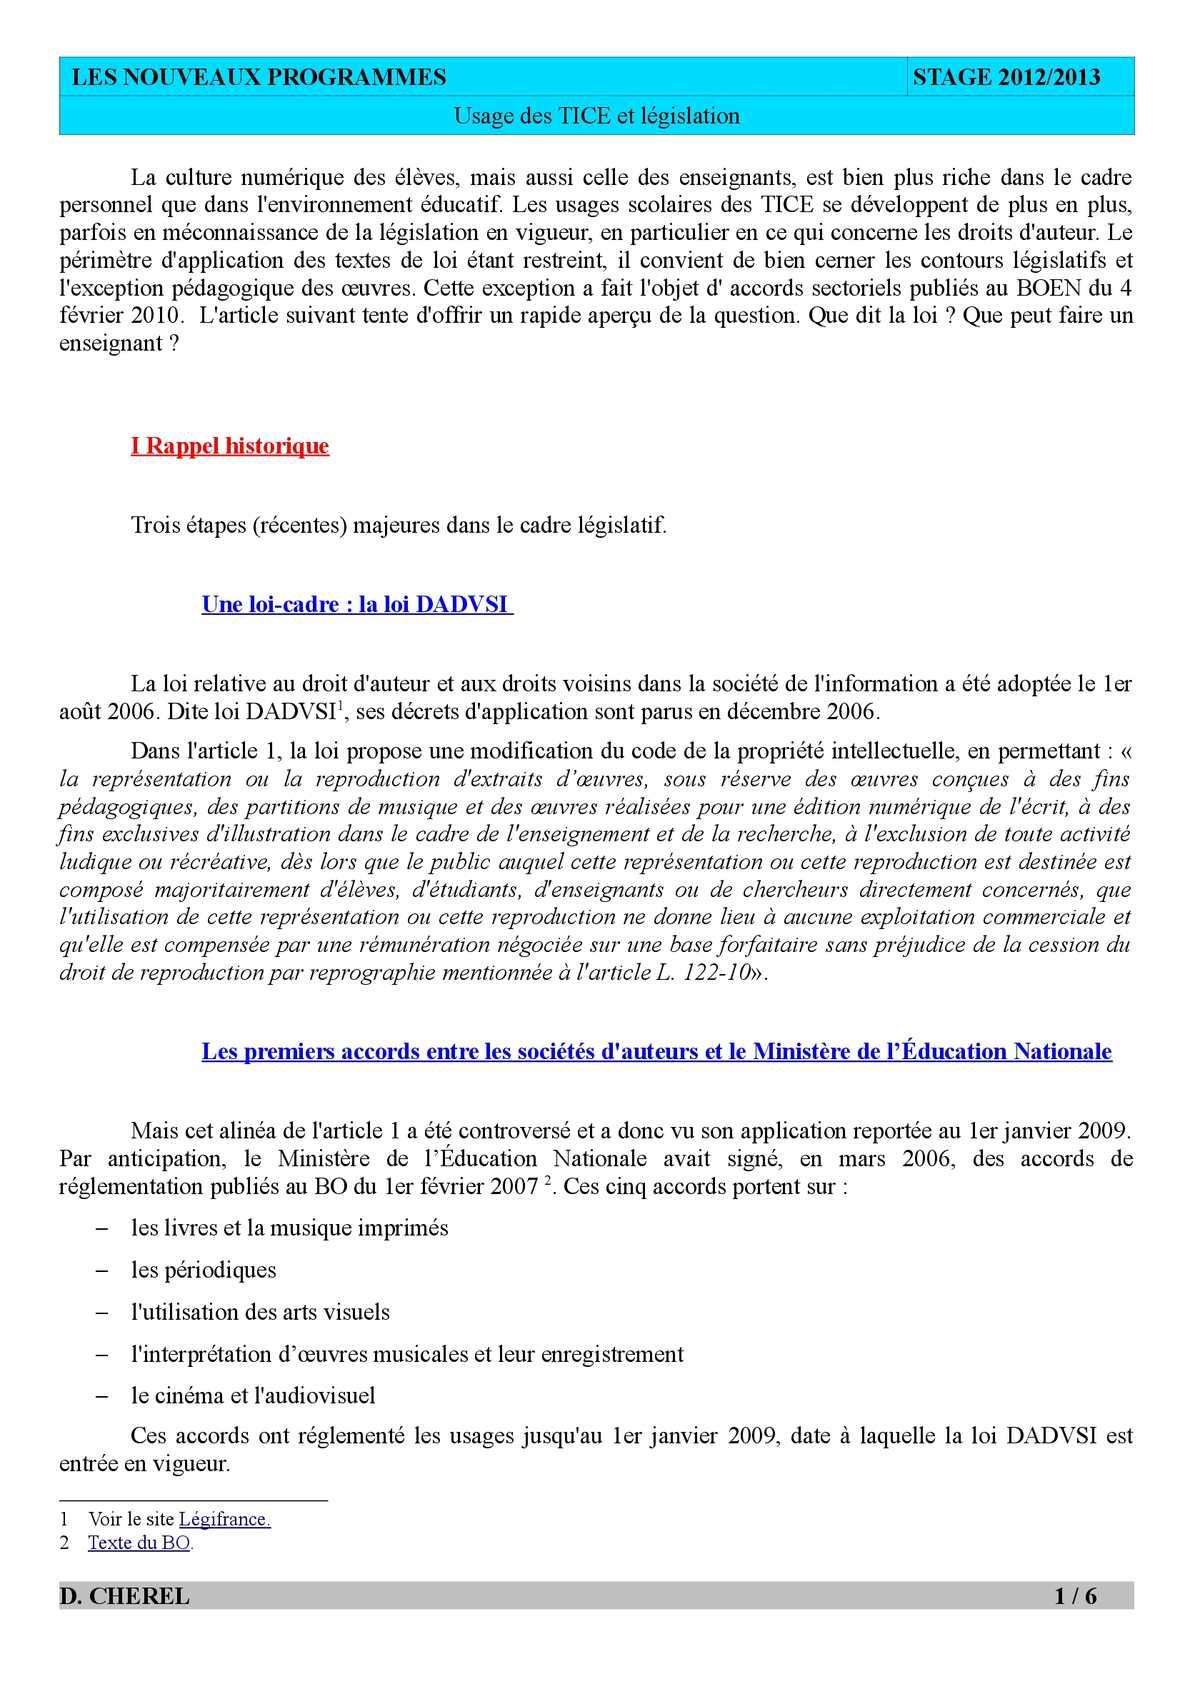 Calaméo - Stage Nvx pour Bo Programmes 2012